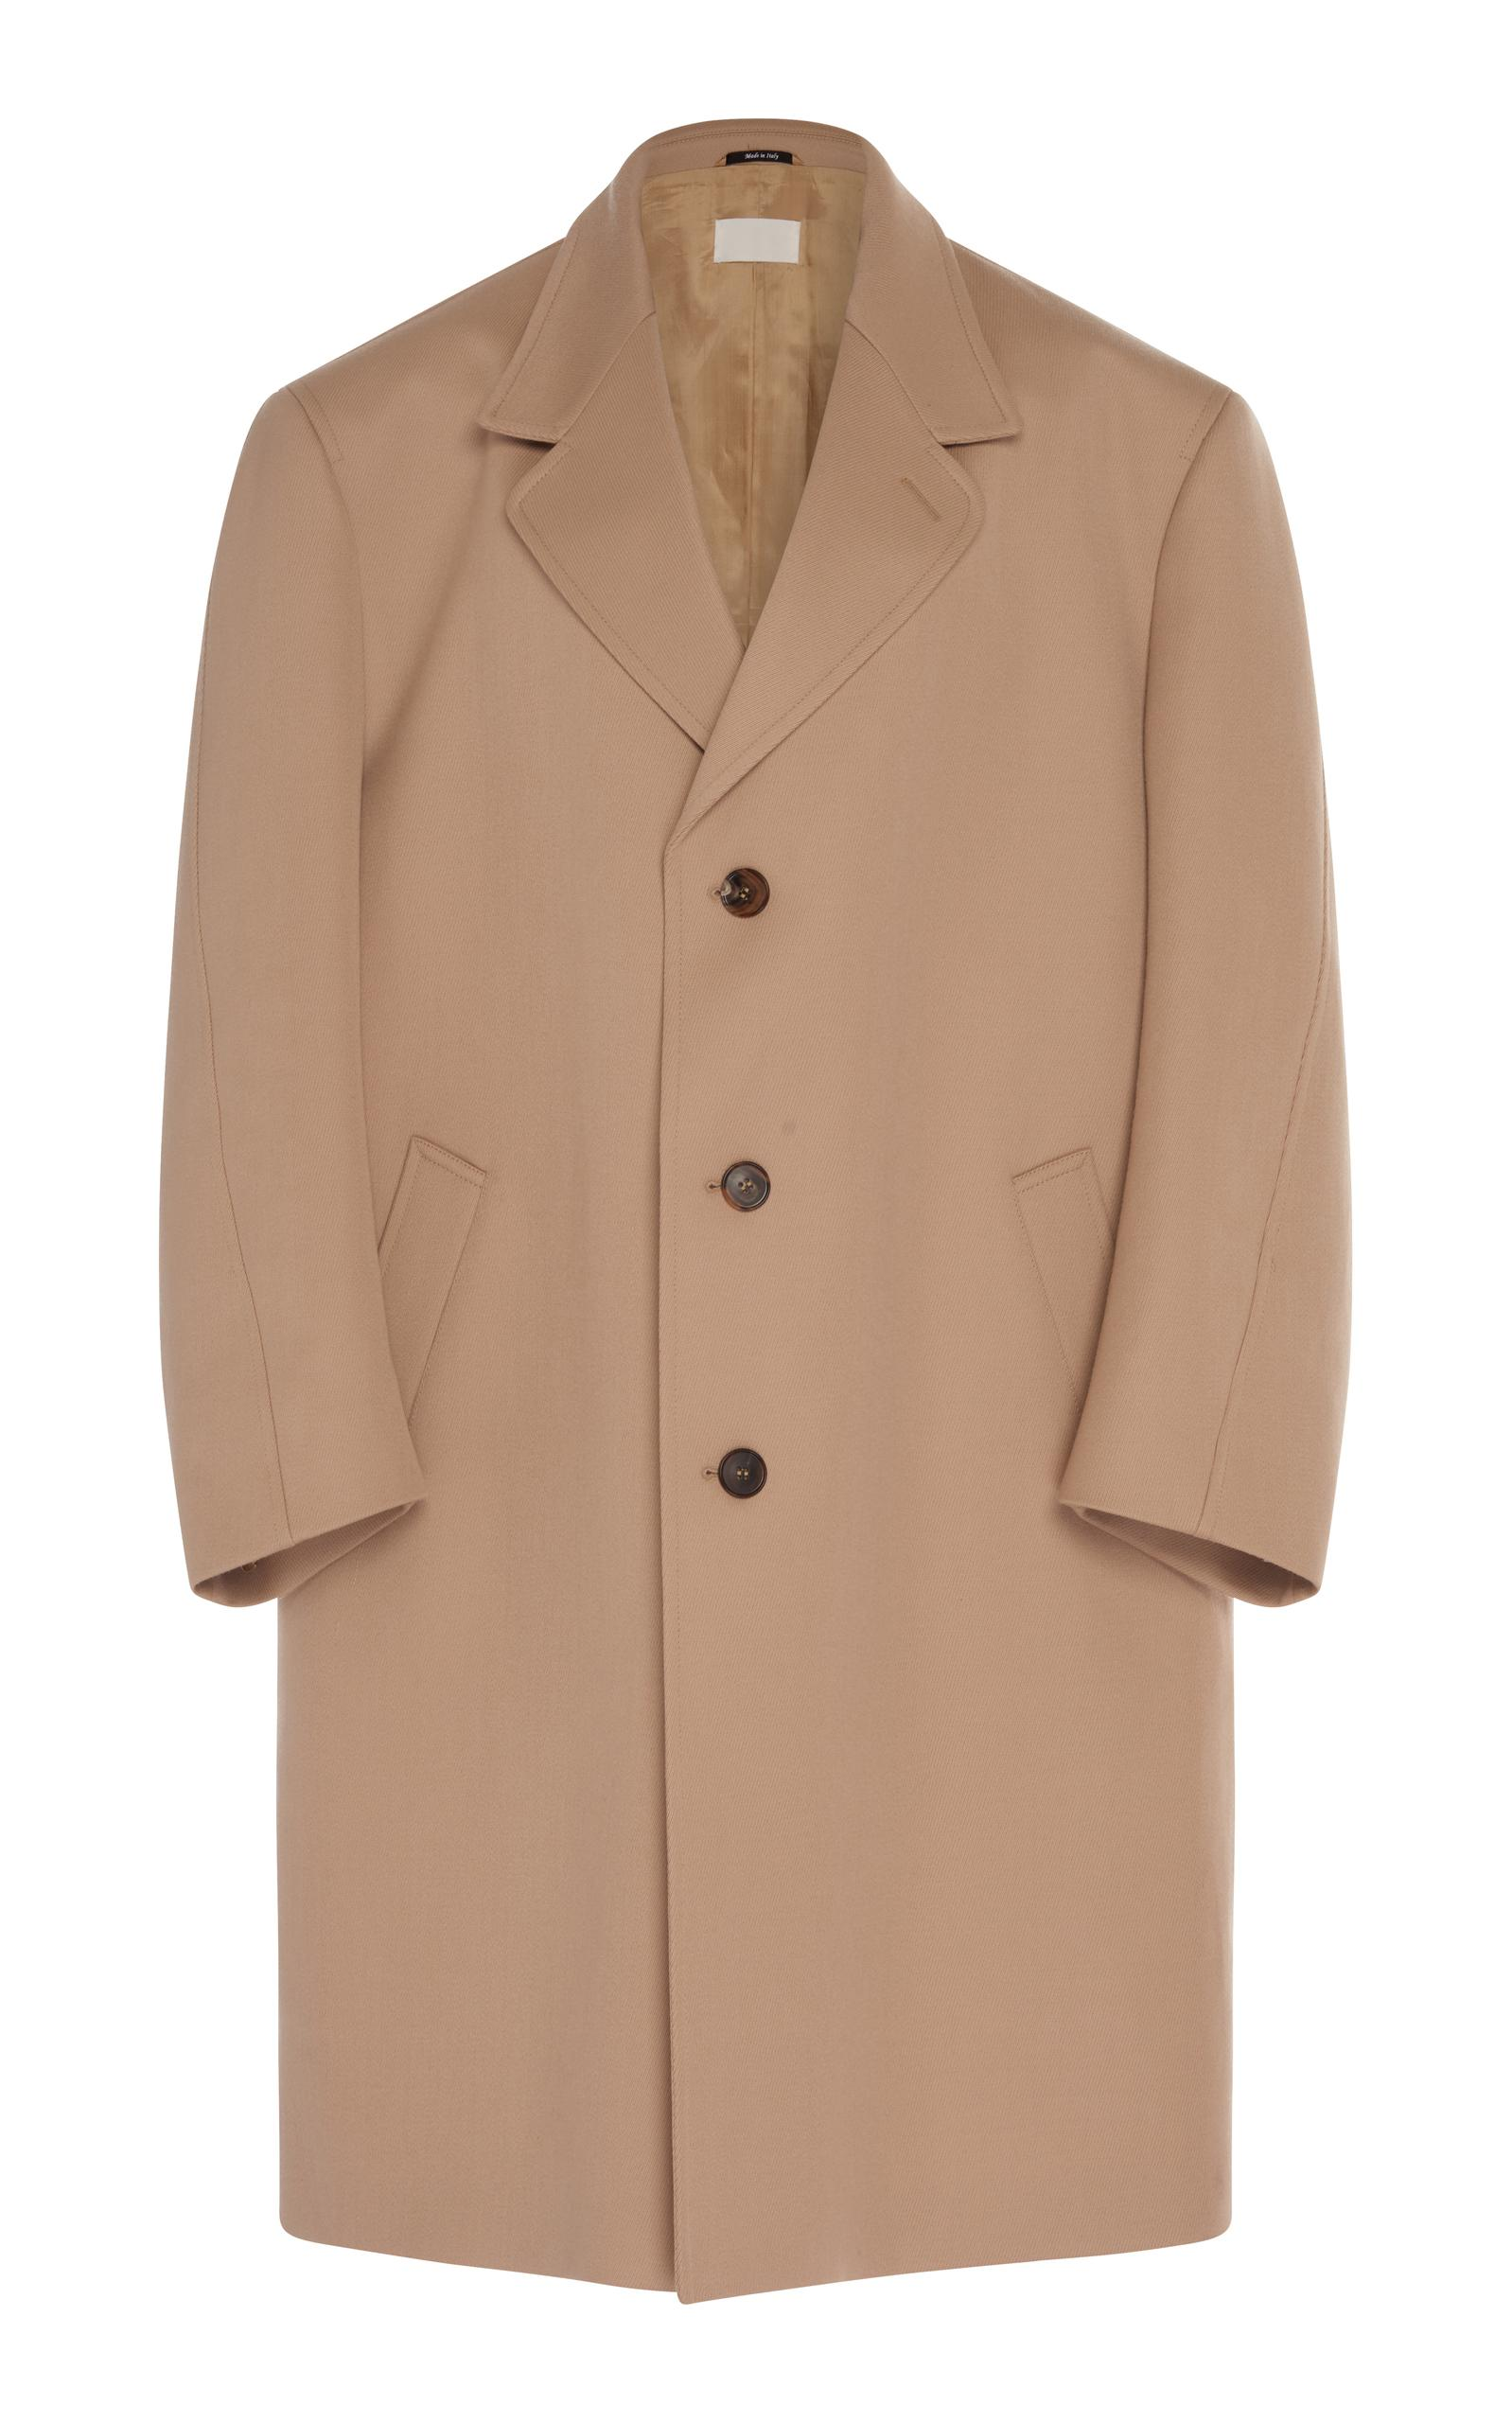 Maison Margiela Oversized Twill Coat In Brown